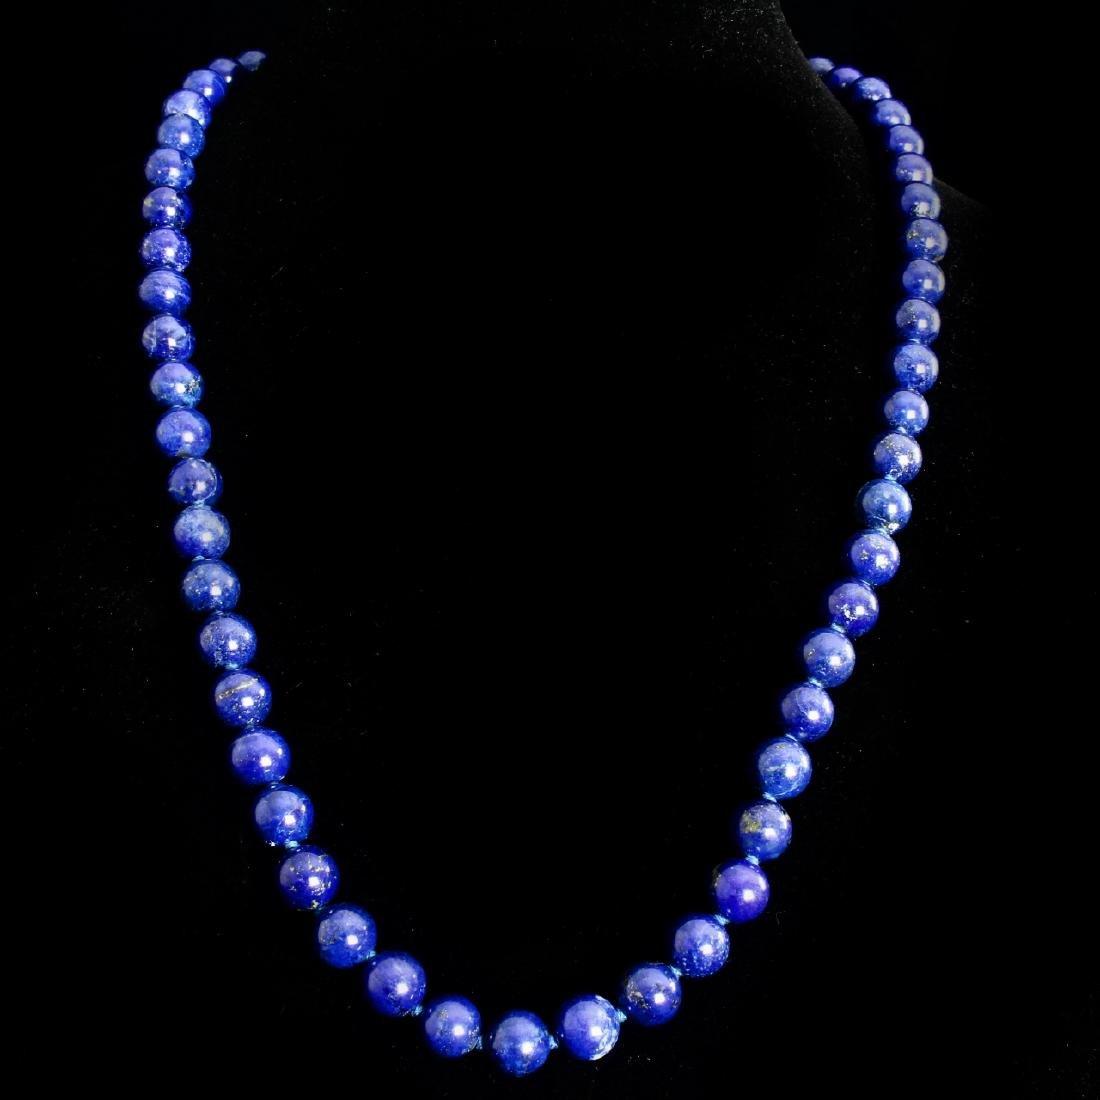 Blue Lapis Lazuli Bead Necklace